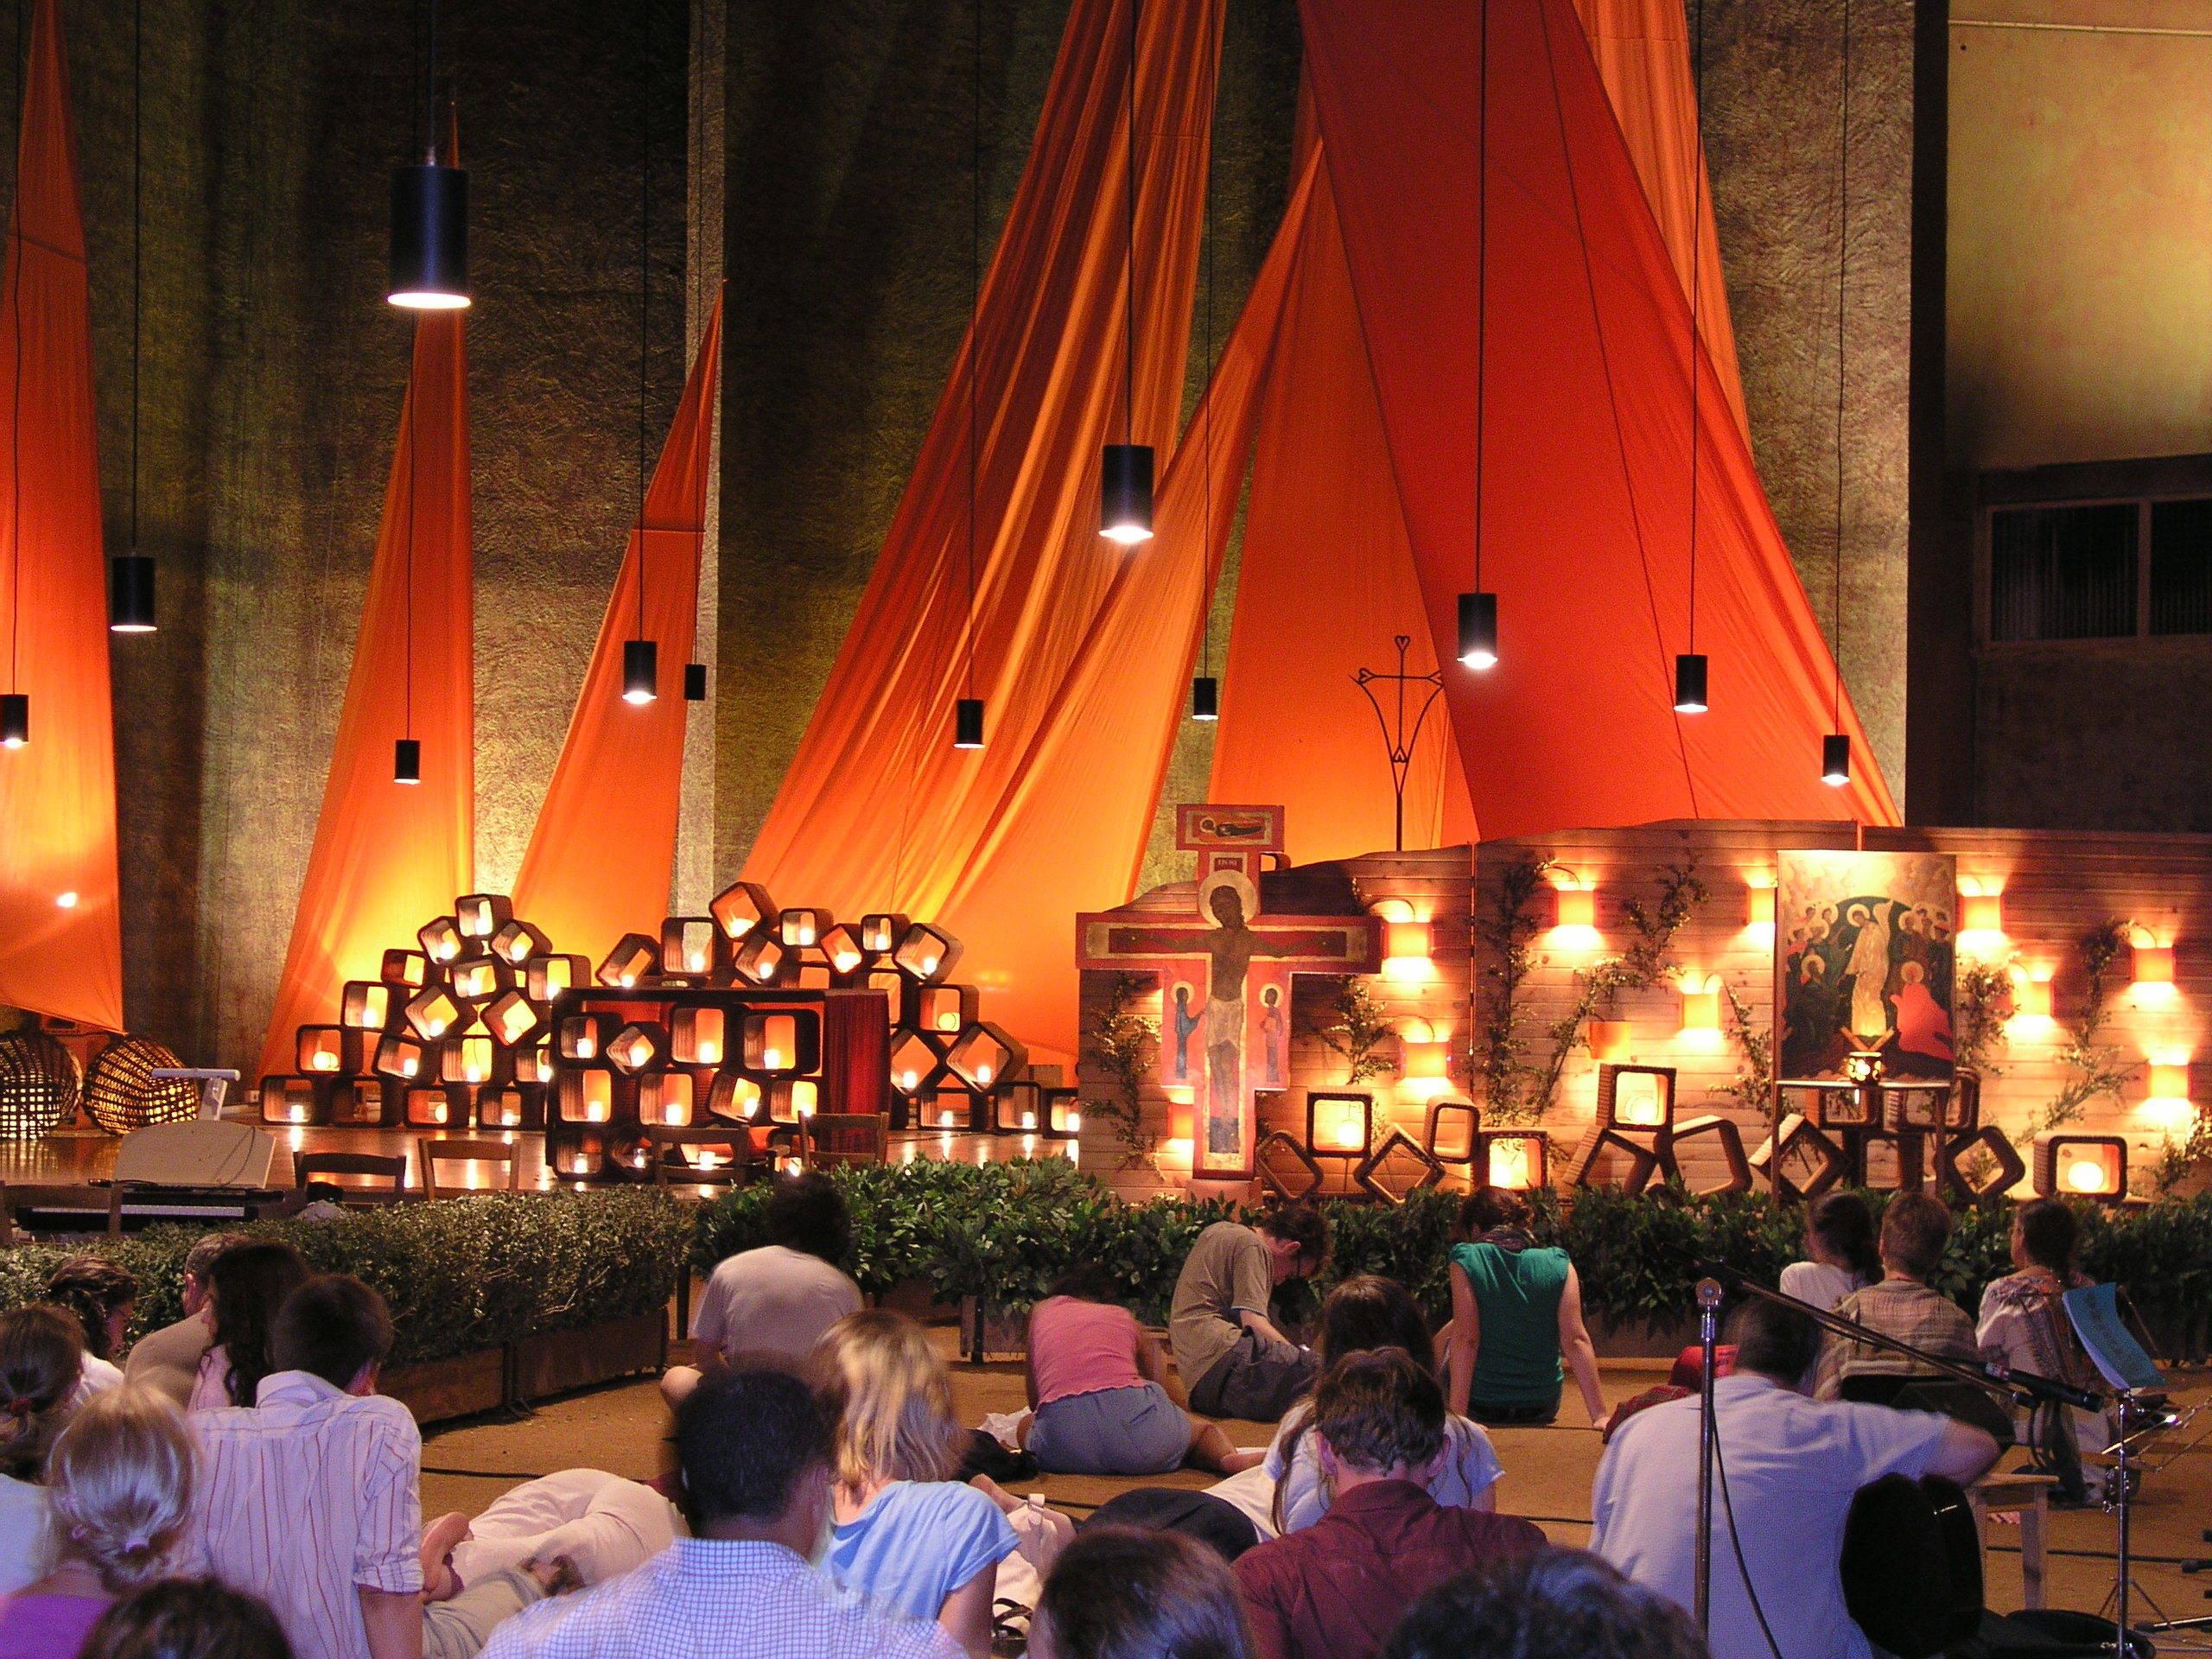 021feae5201e54ae0cbd_Taize_-_Photo_at_church_of_the_reconciliation_2_-_Taiz__prayer.JPG